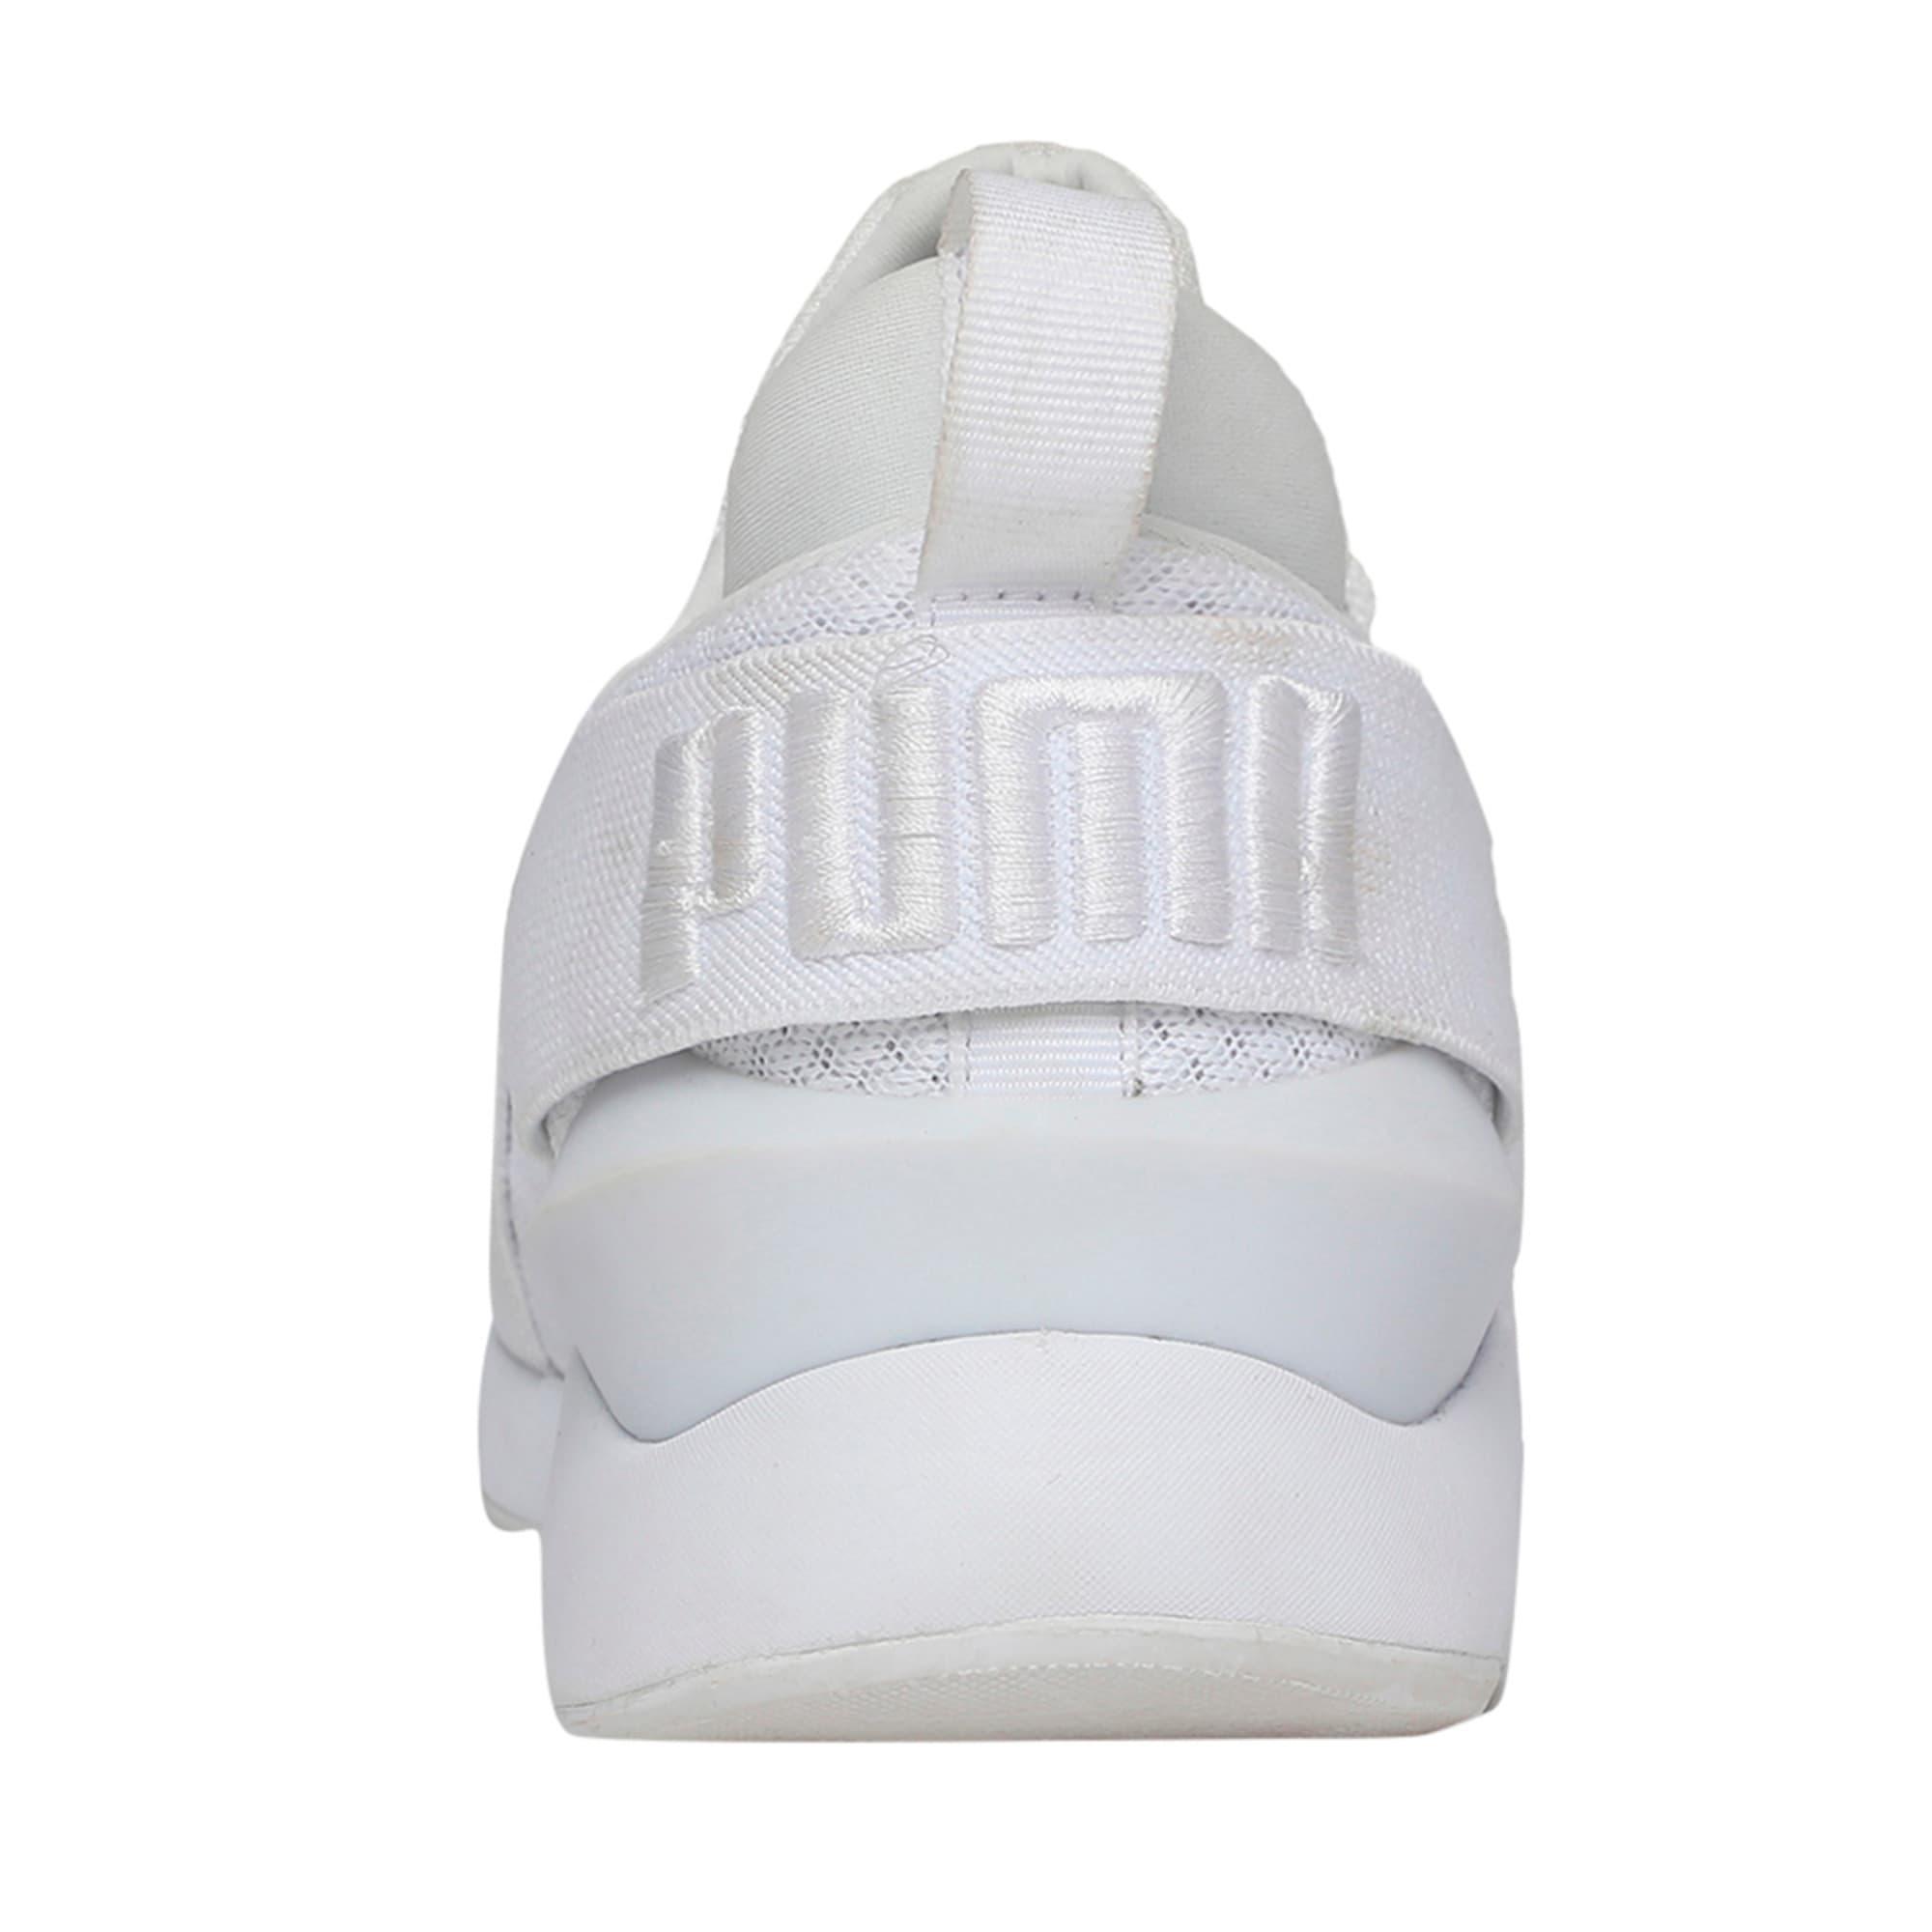 Thumbnail 3 of Muse En Pointe Women's Shoes, Puma White-Puma White, medium-IND